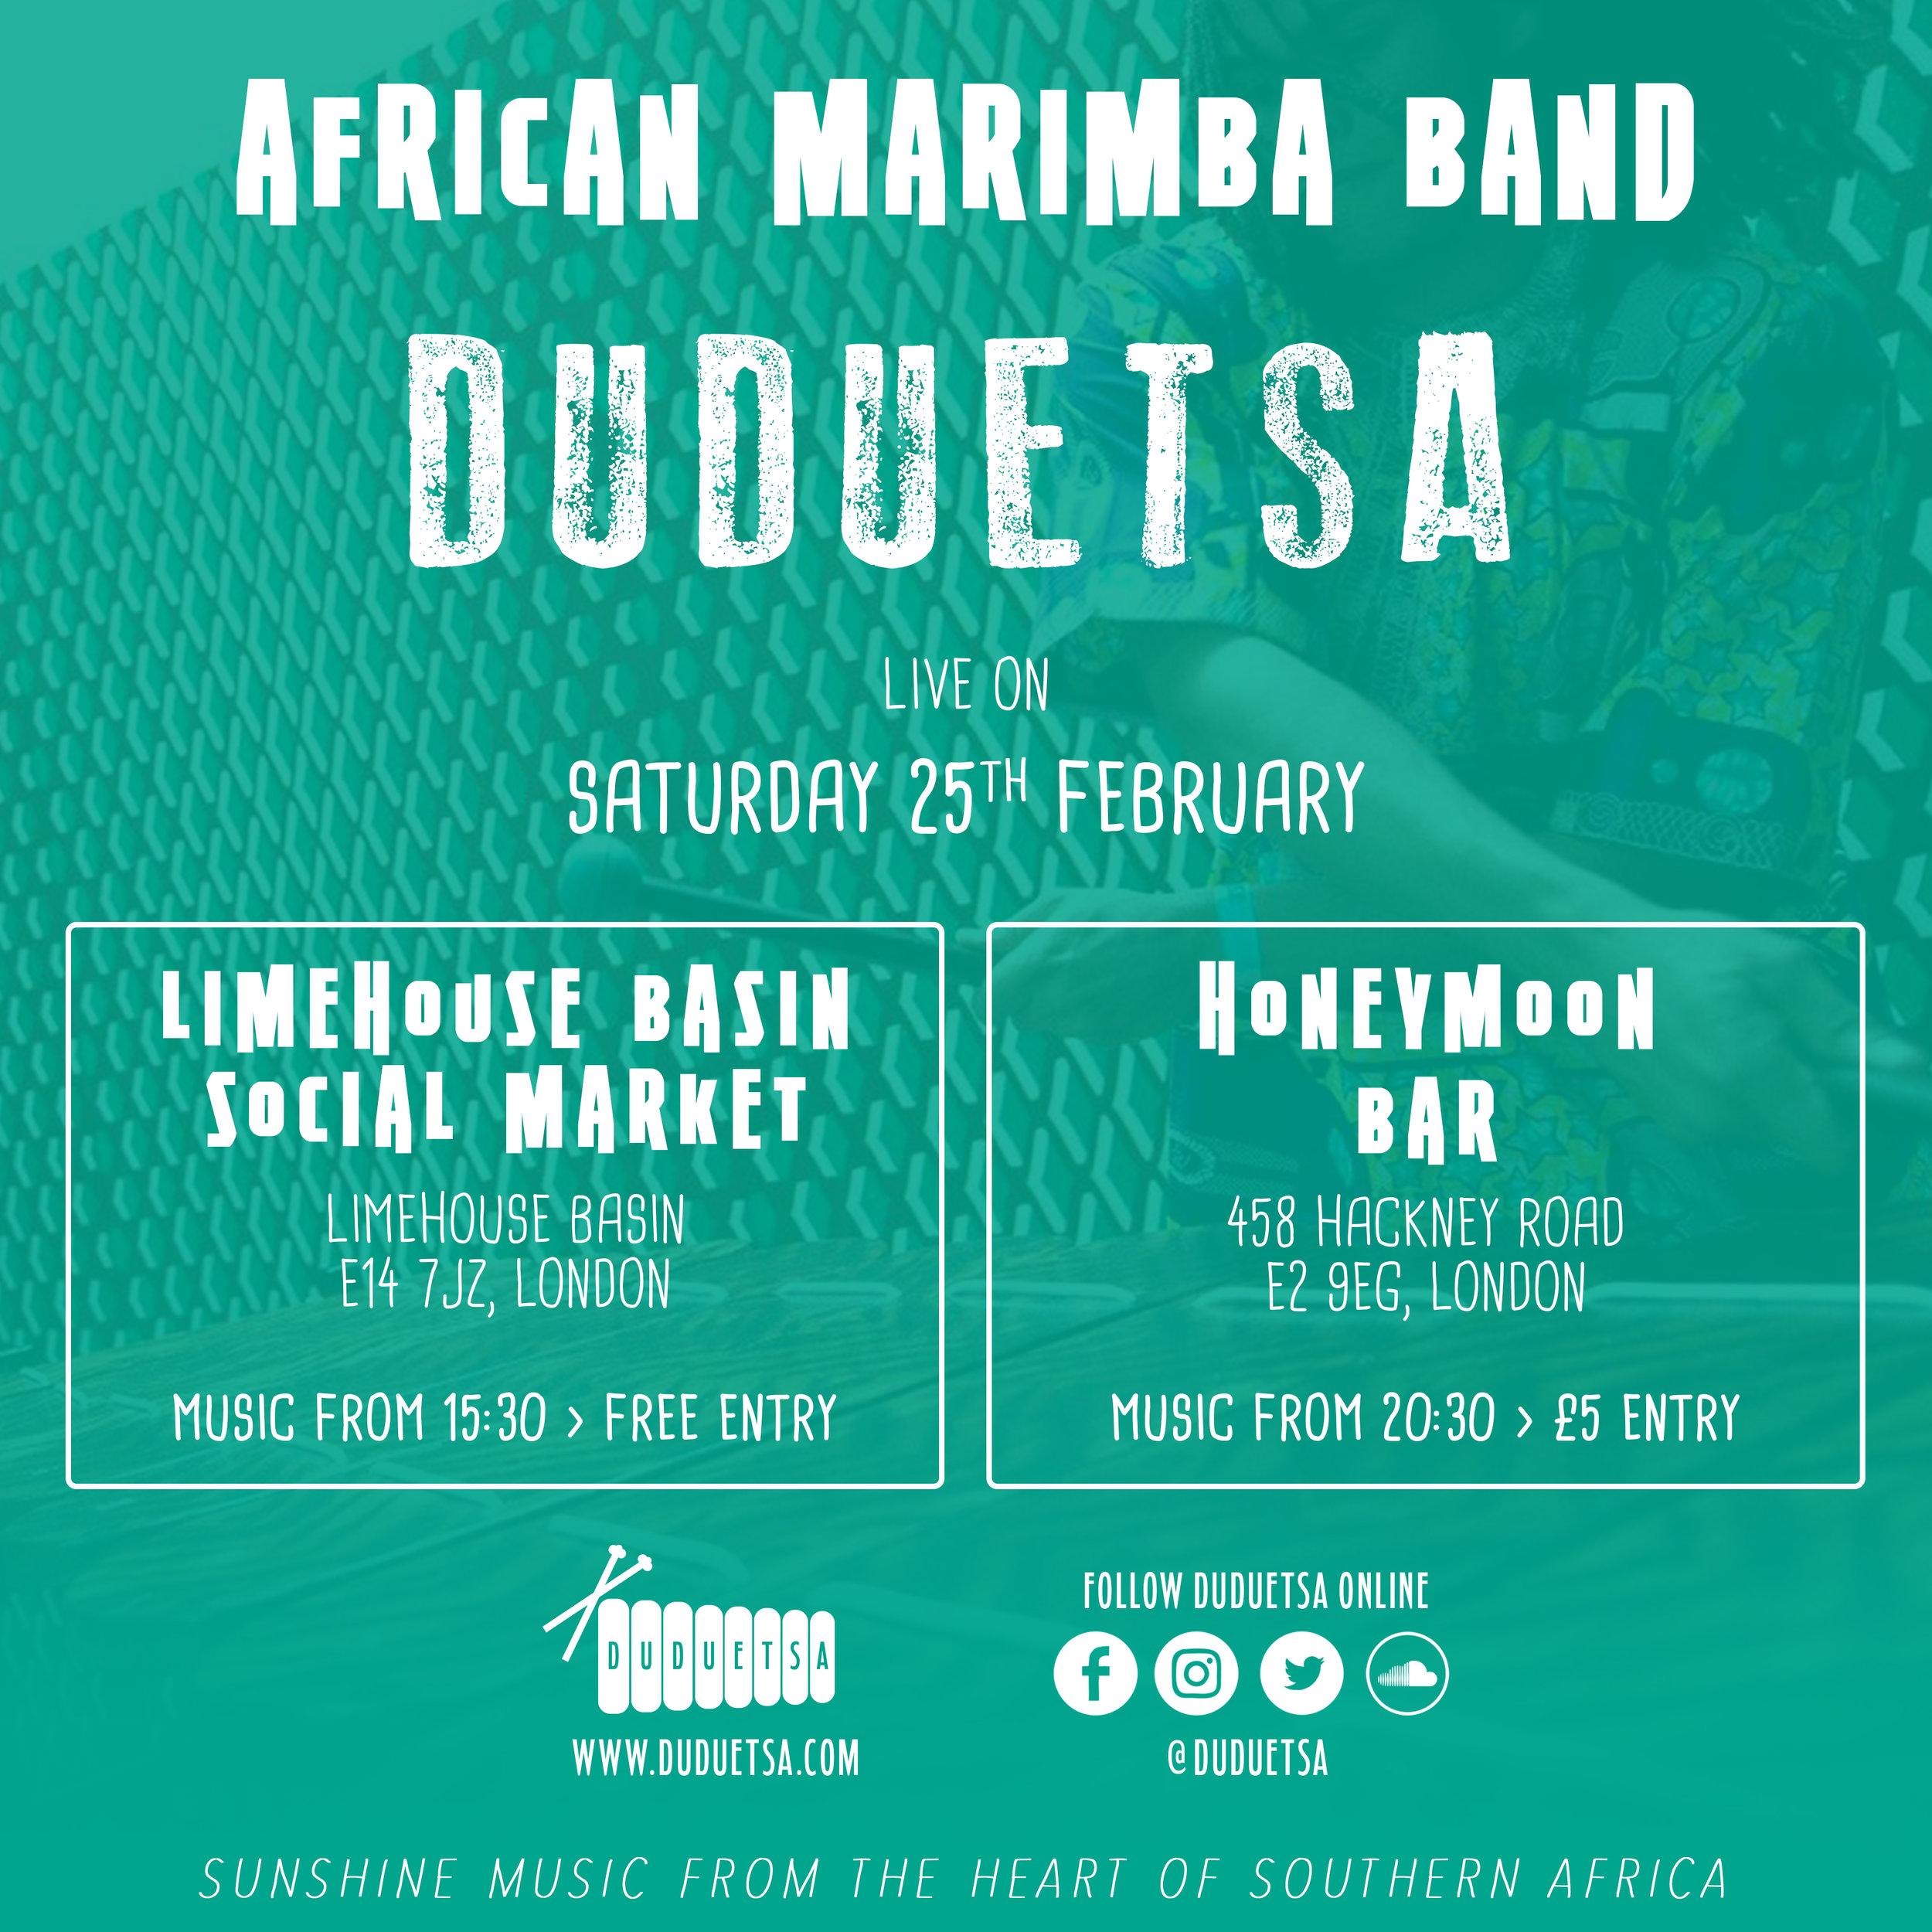 Duduetsa African Marimba Band